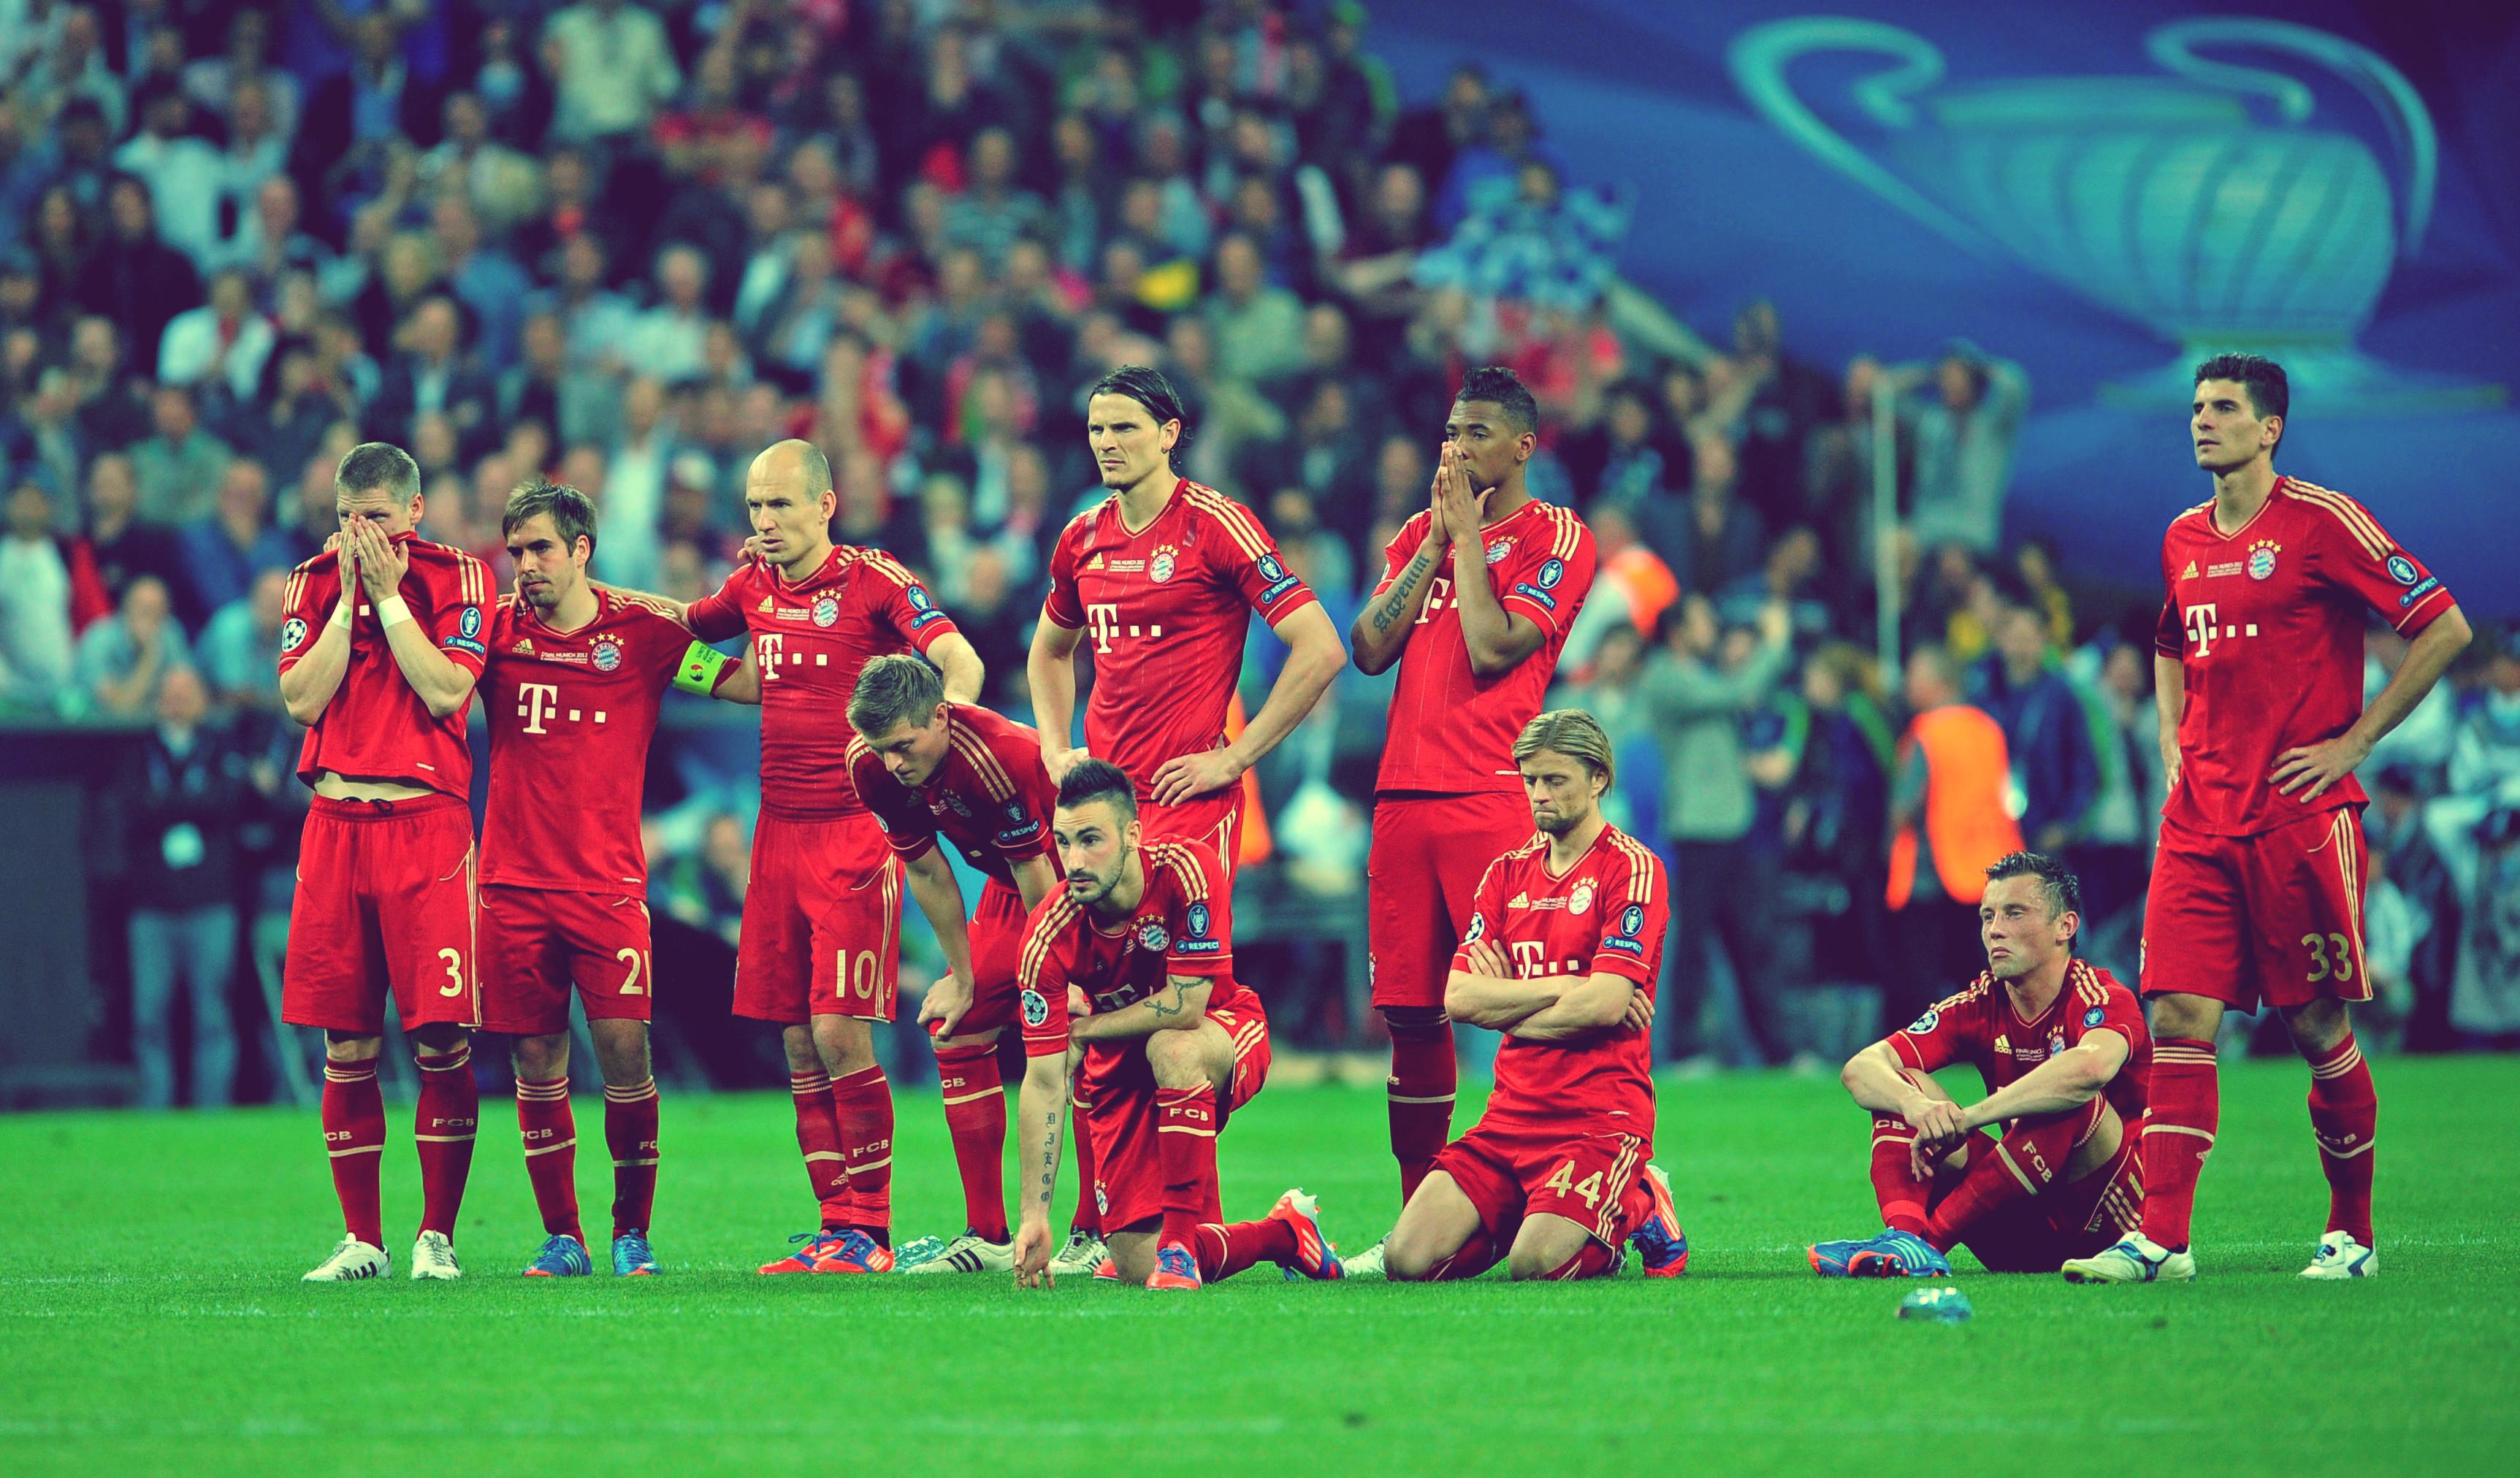 Bayern Munich Wallpaper 75 Pictures